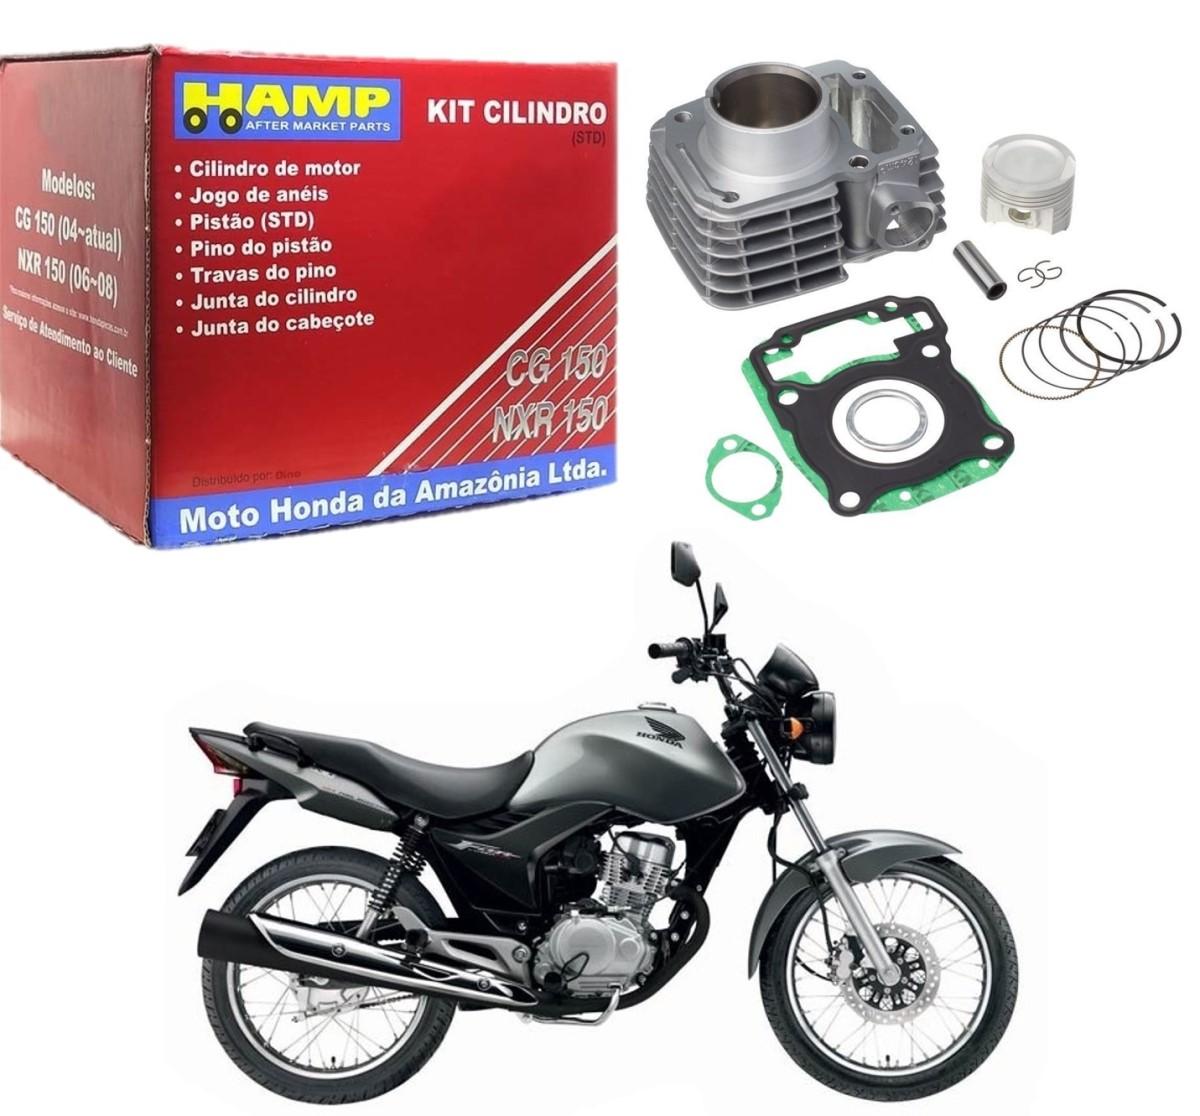 Kit Cilindro Motor CG 150 / Titan 150 / Fan 150 / Bros NXR 150 Stander HAMP